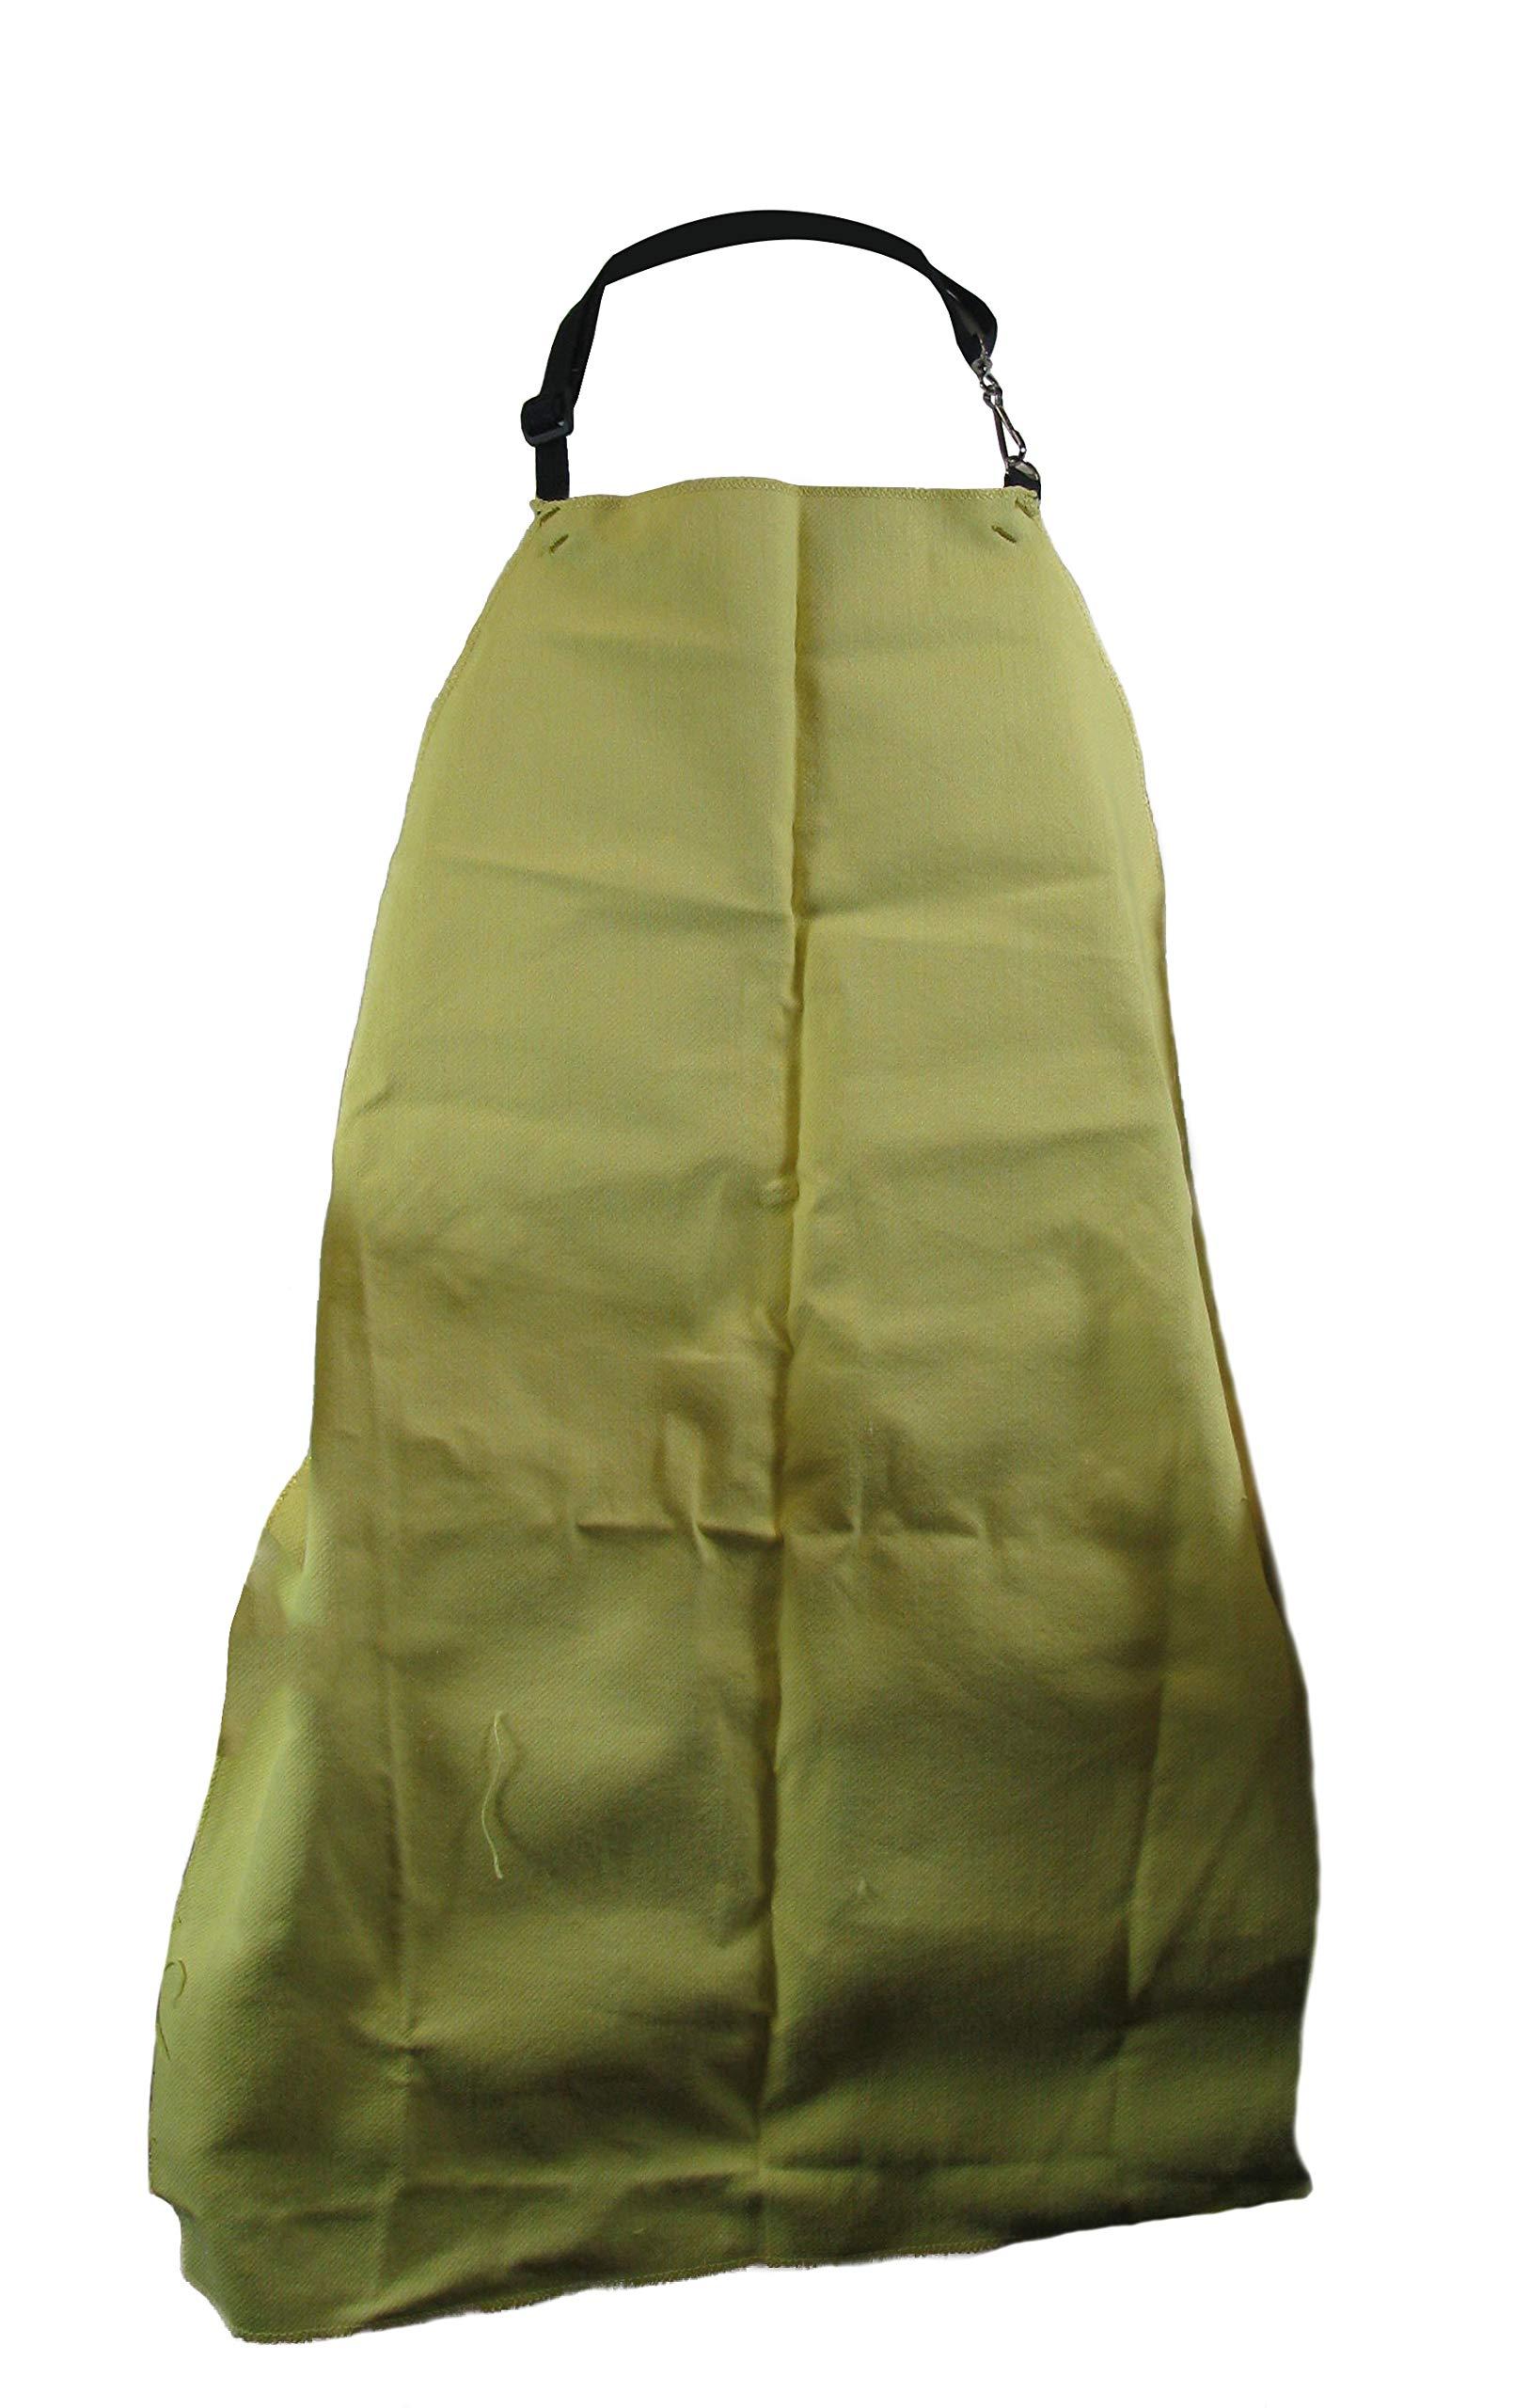 Magid Glove & Safety KEV24X30 Woven Kevlar Bib Apron, 24'' x 30'', Yellow